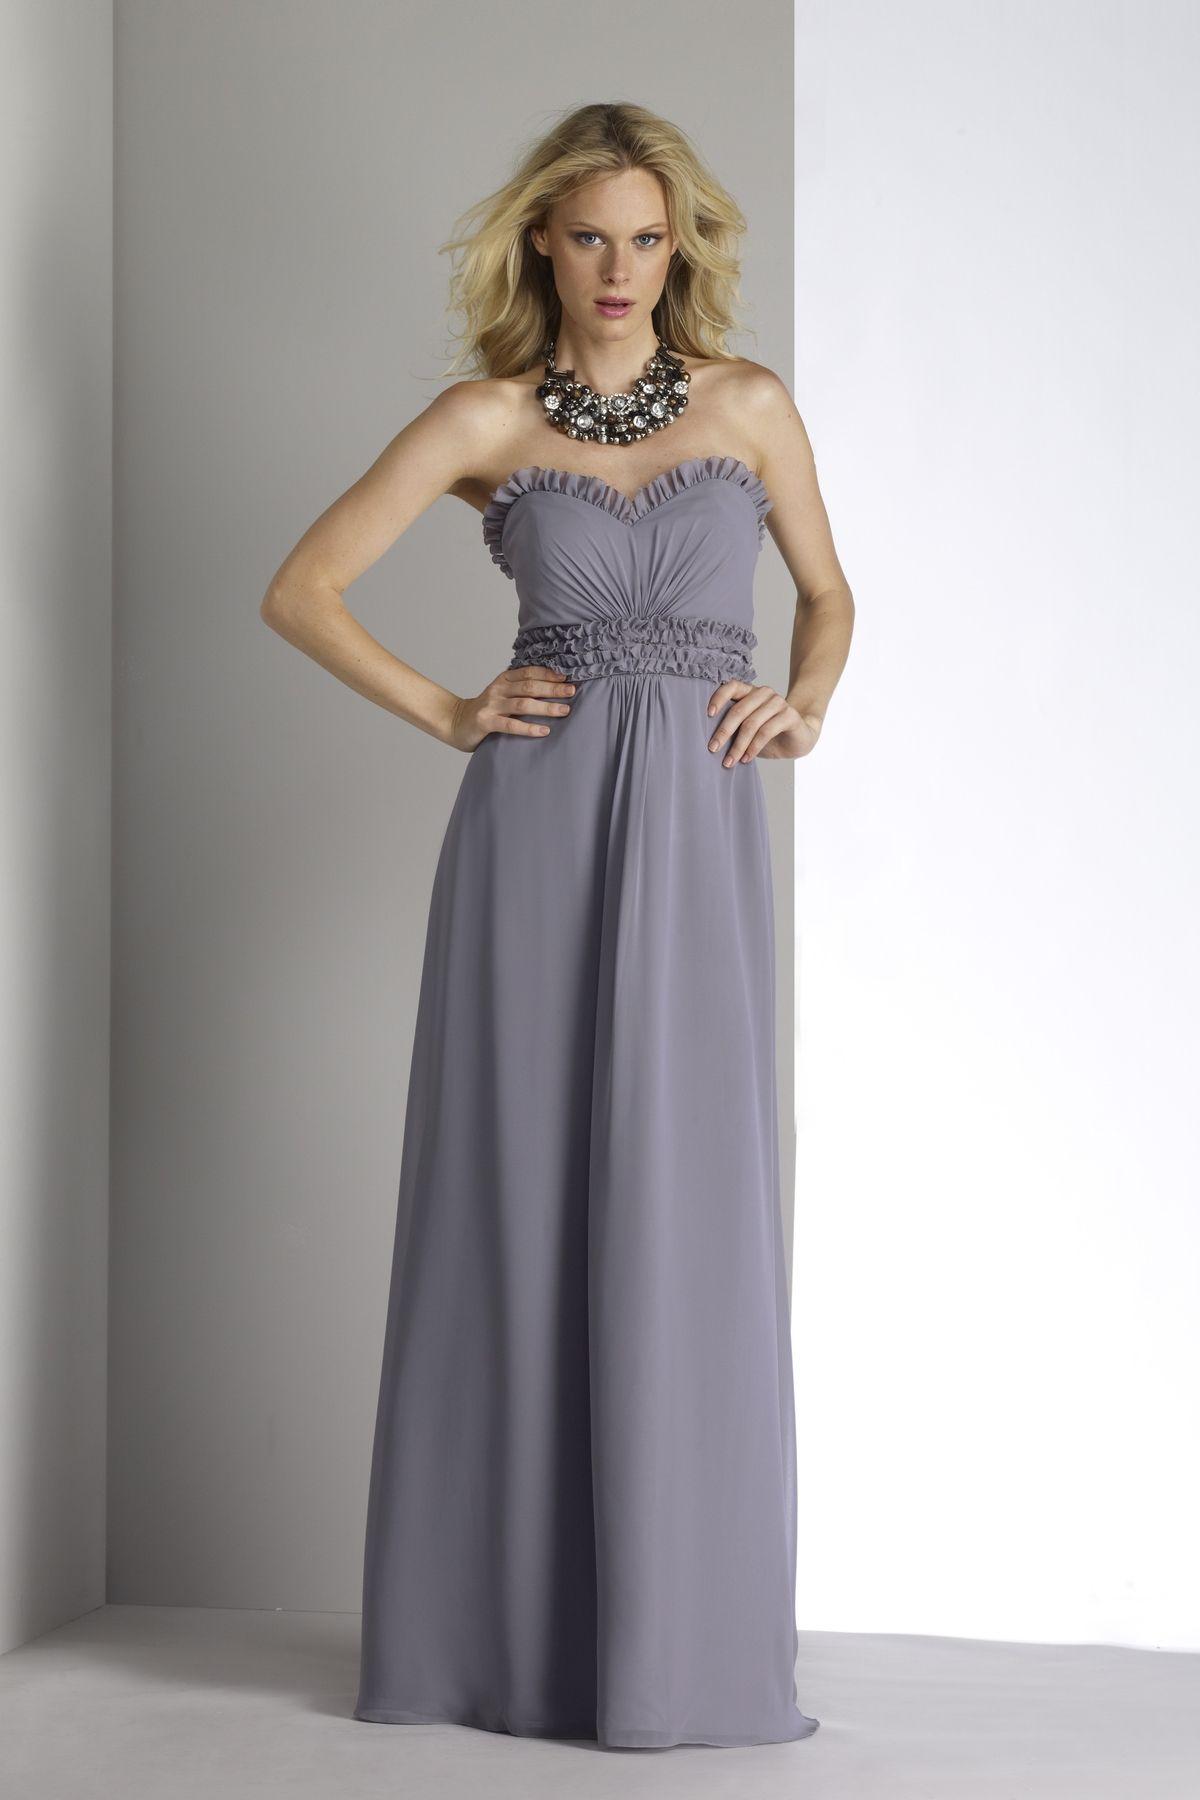 Chiffon wedding dress empire waist  Elegant sleeveless with empire waist dress for bridesmaid  Fall